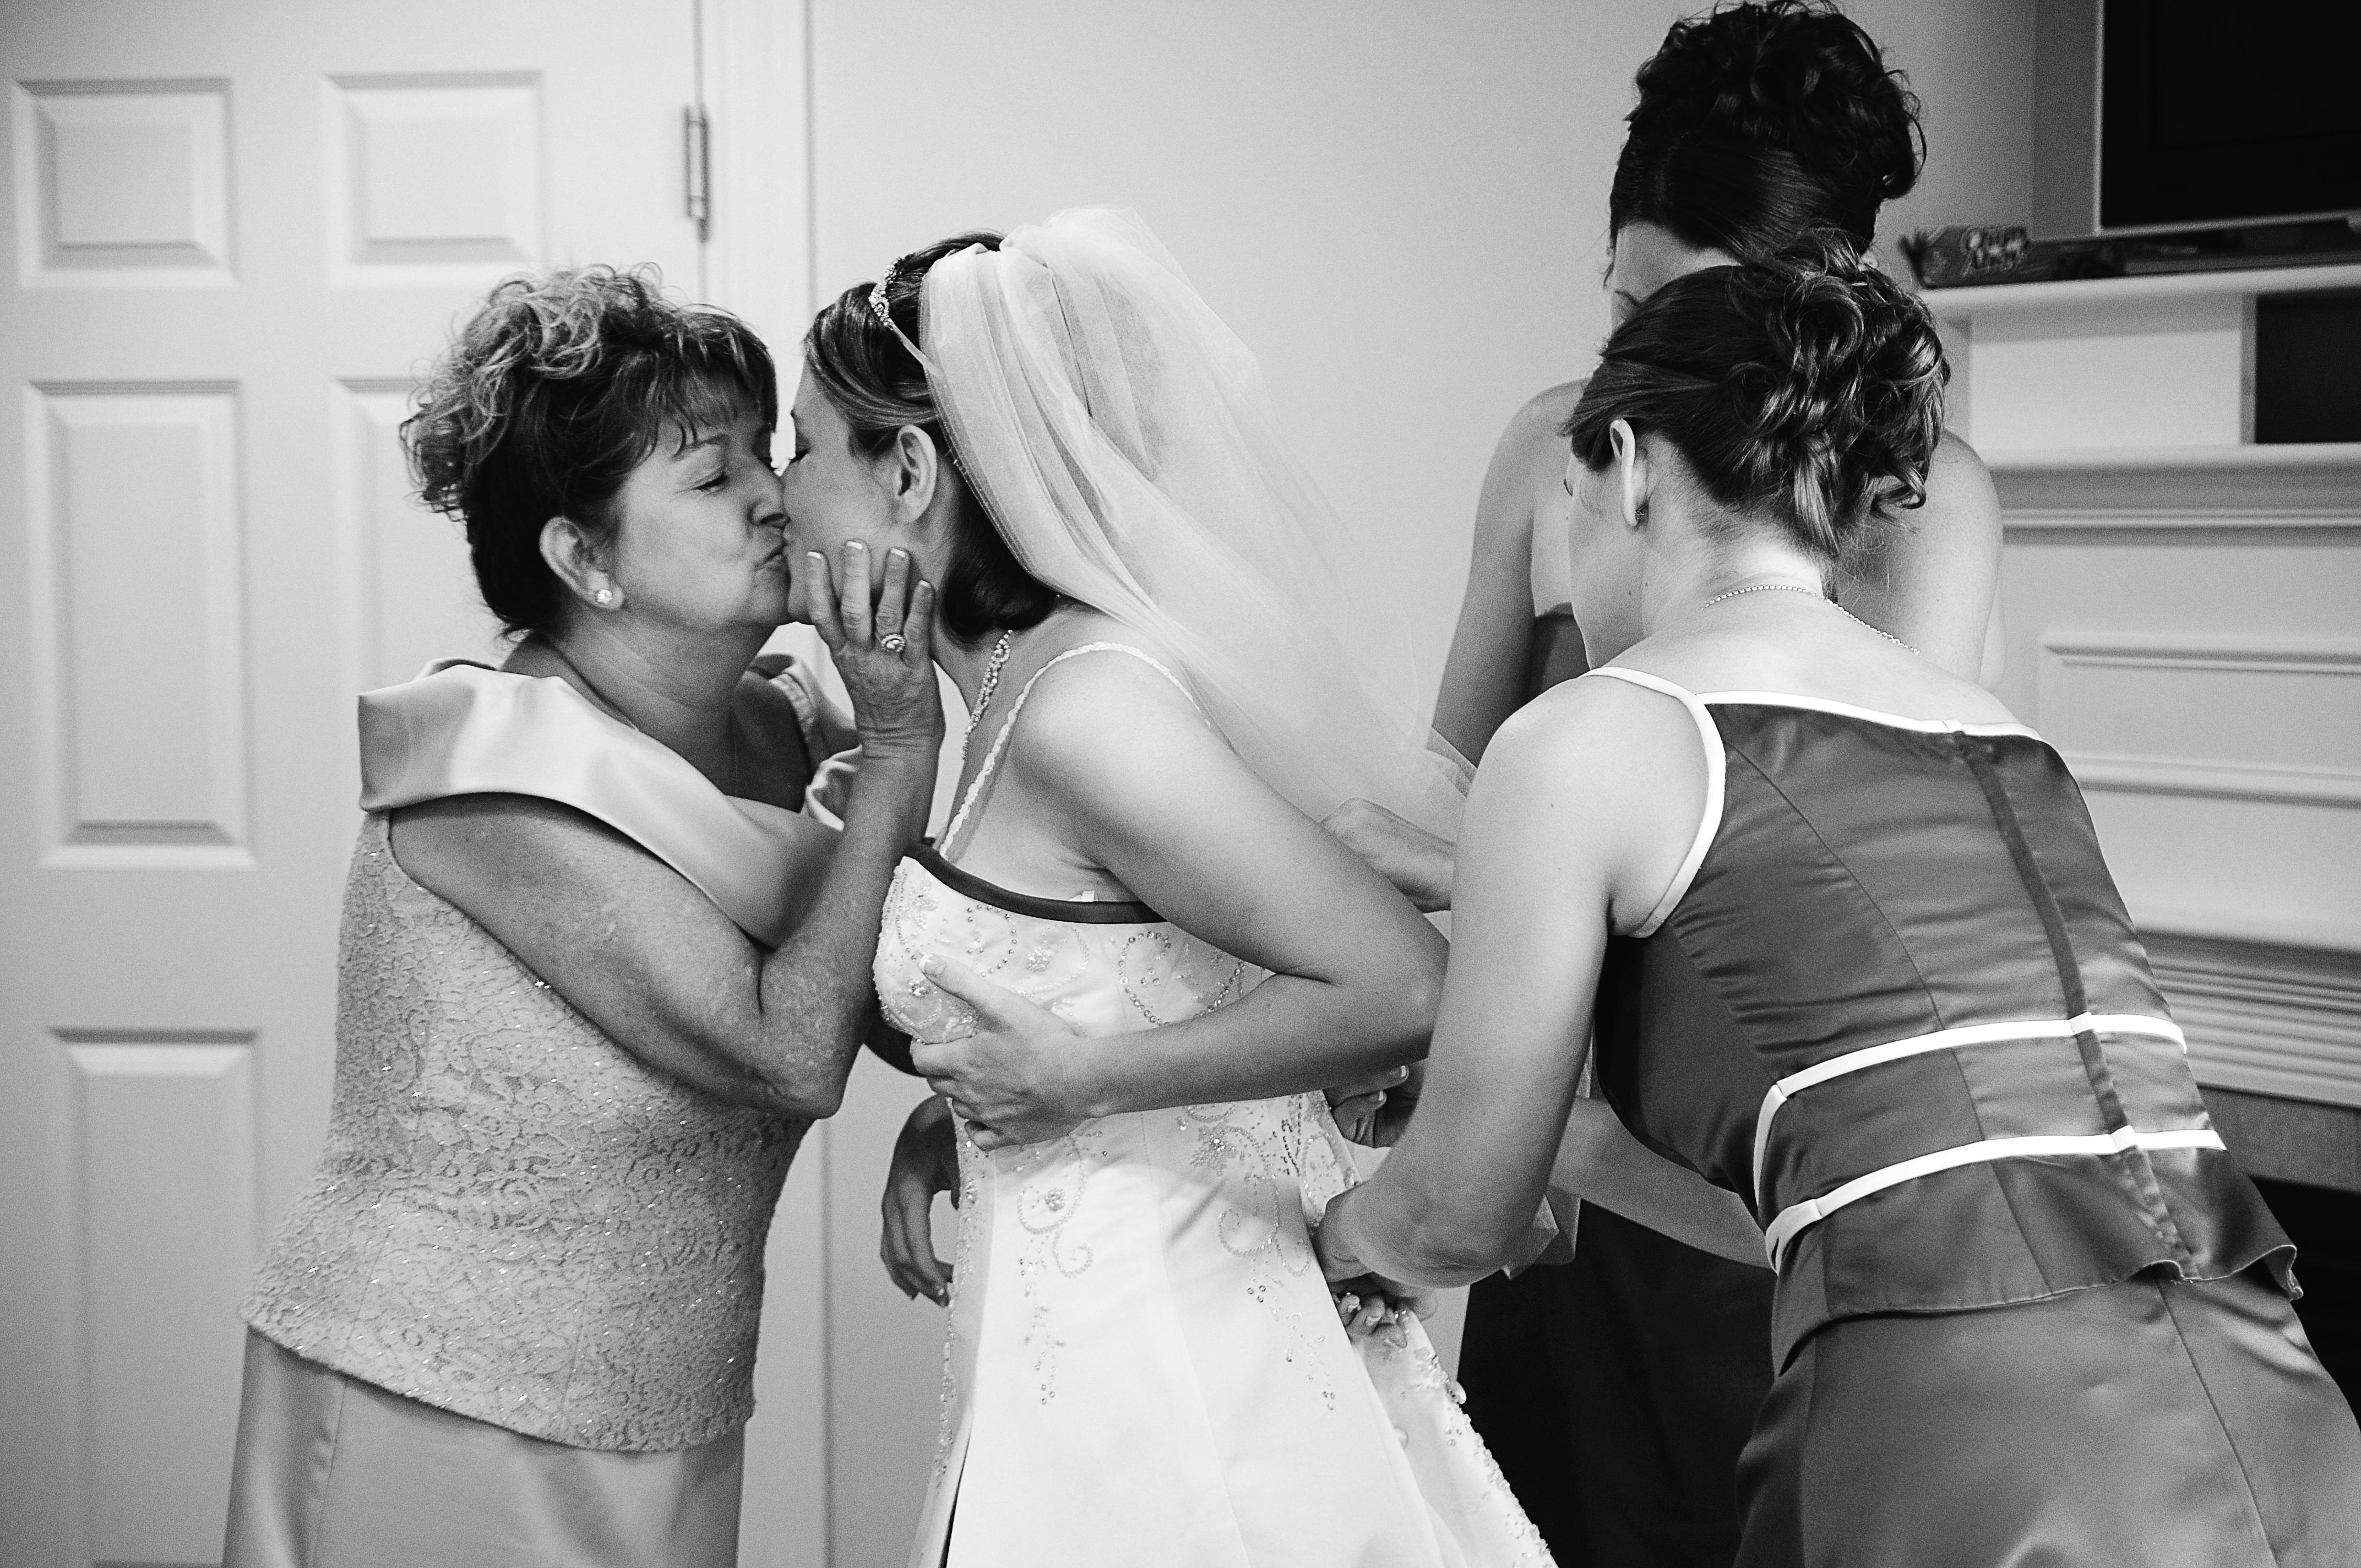 Beauty, Bridesmaids, Bridesmaids Dresses, Wedding Dresses, Fashion, white, black, dress, Bride, Kiss, Hair, Mother, Getting, Ready, Studio six-o-three photography